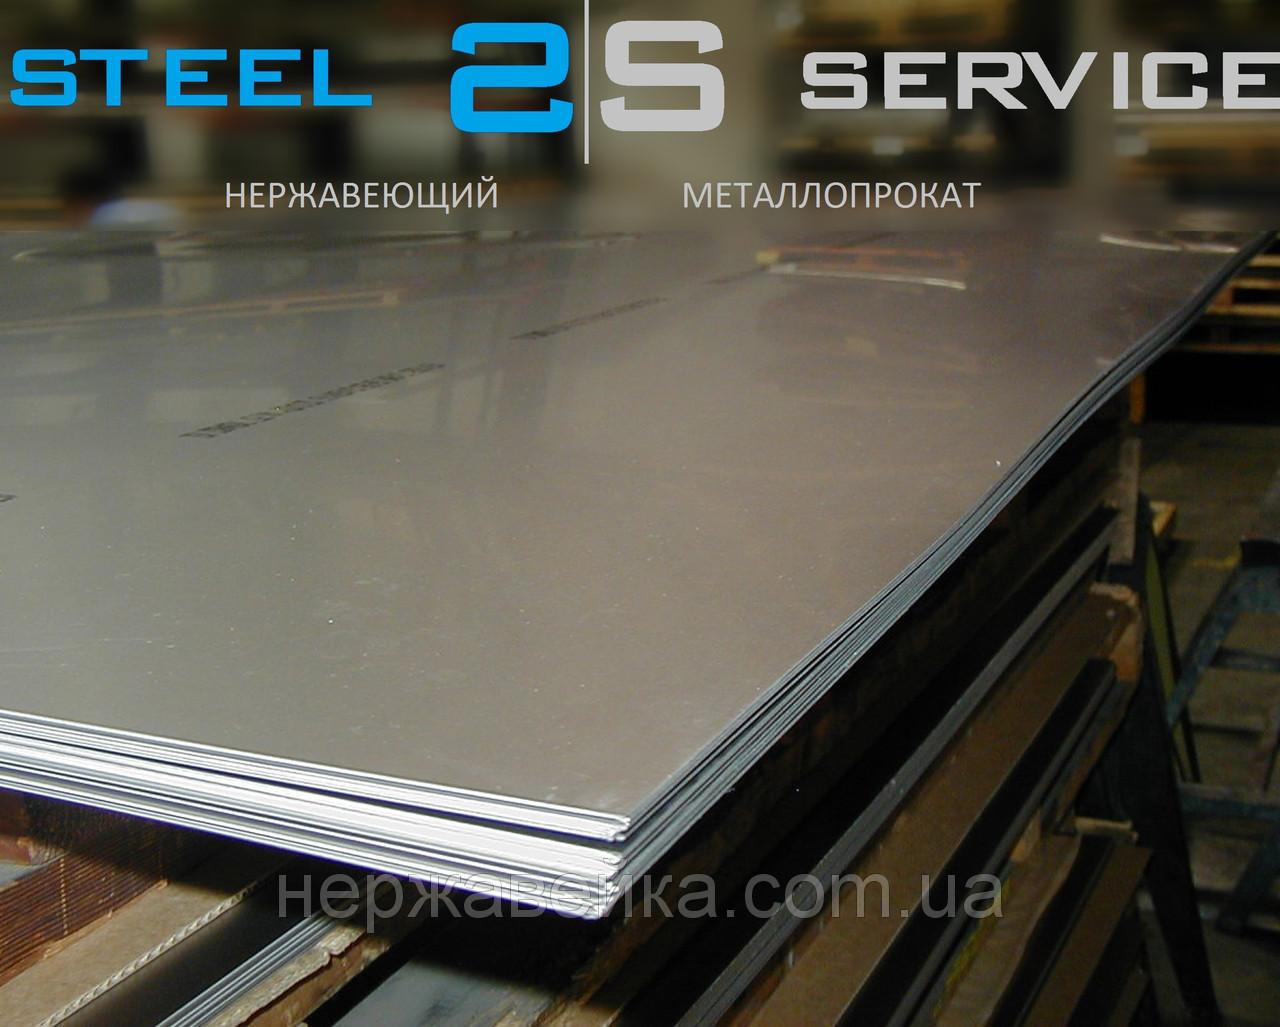 Нержавейка лист 2х1500х3000мм  AISI 321(08Х18Н10Т) 2B - матовый,  пищевой